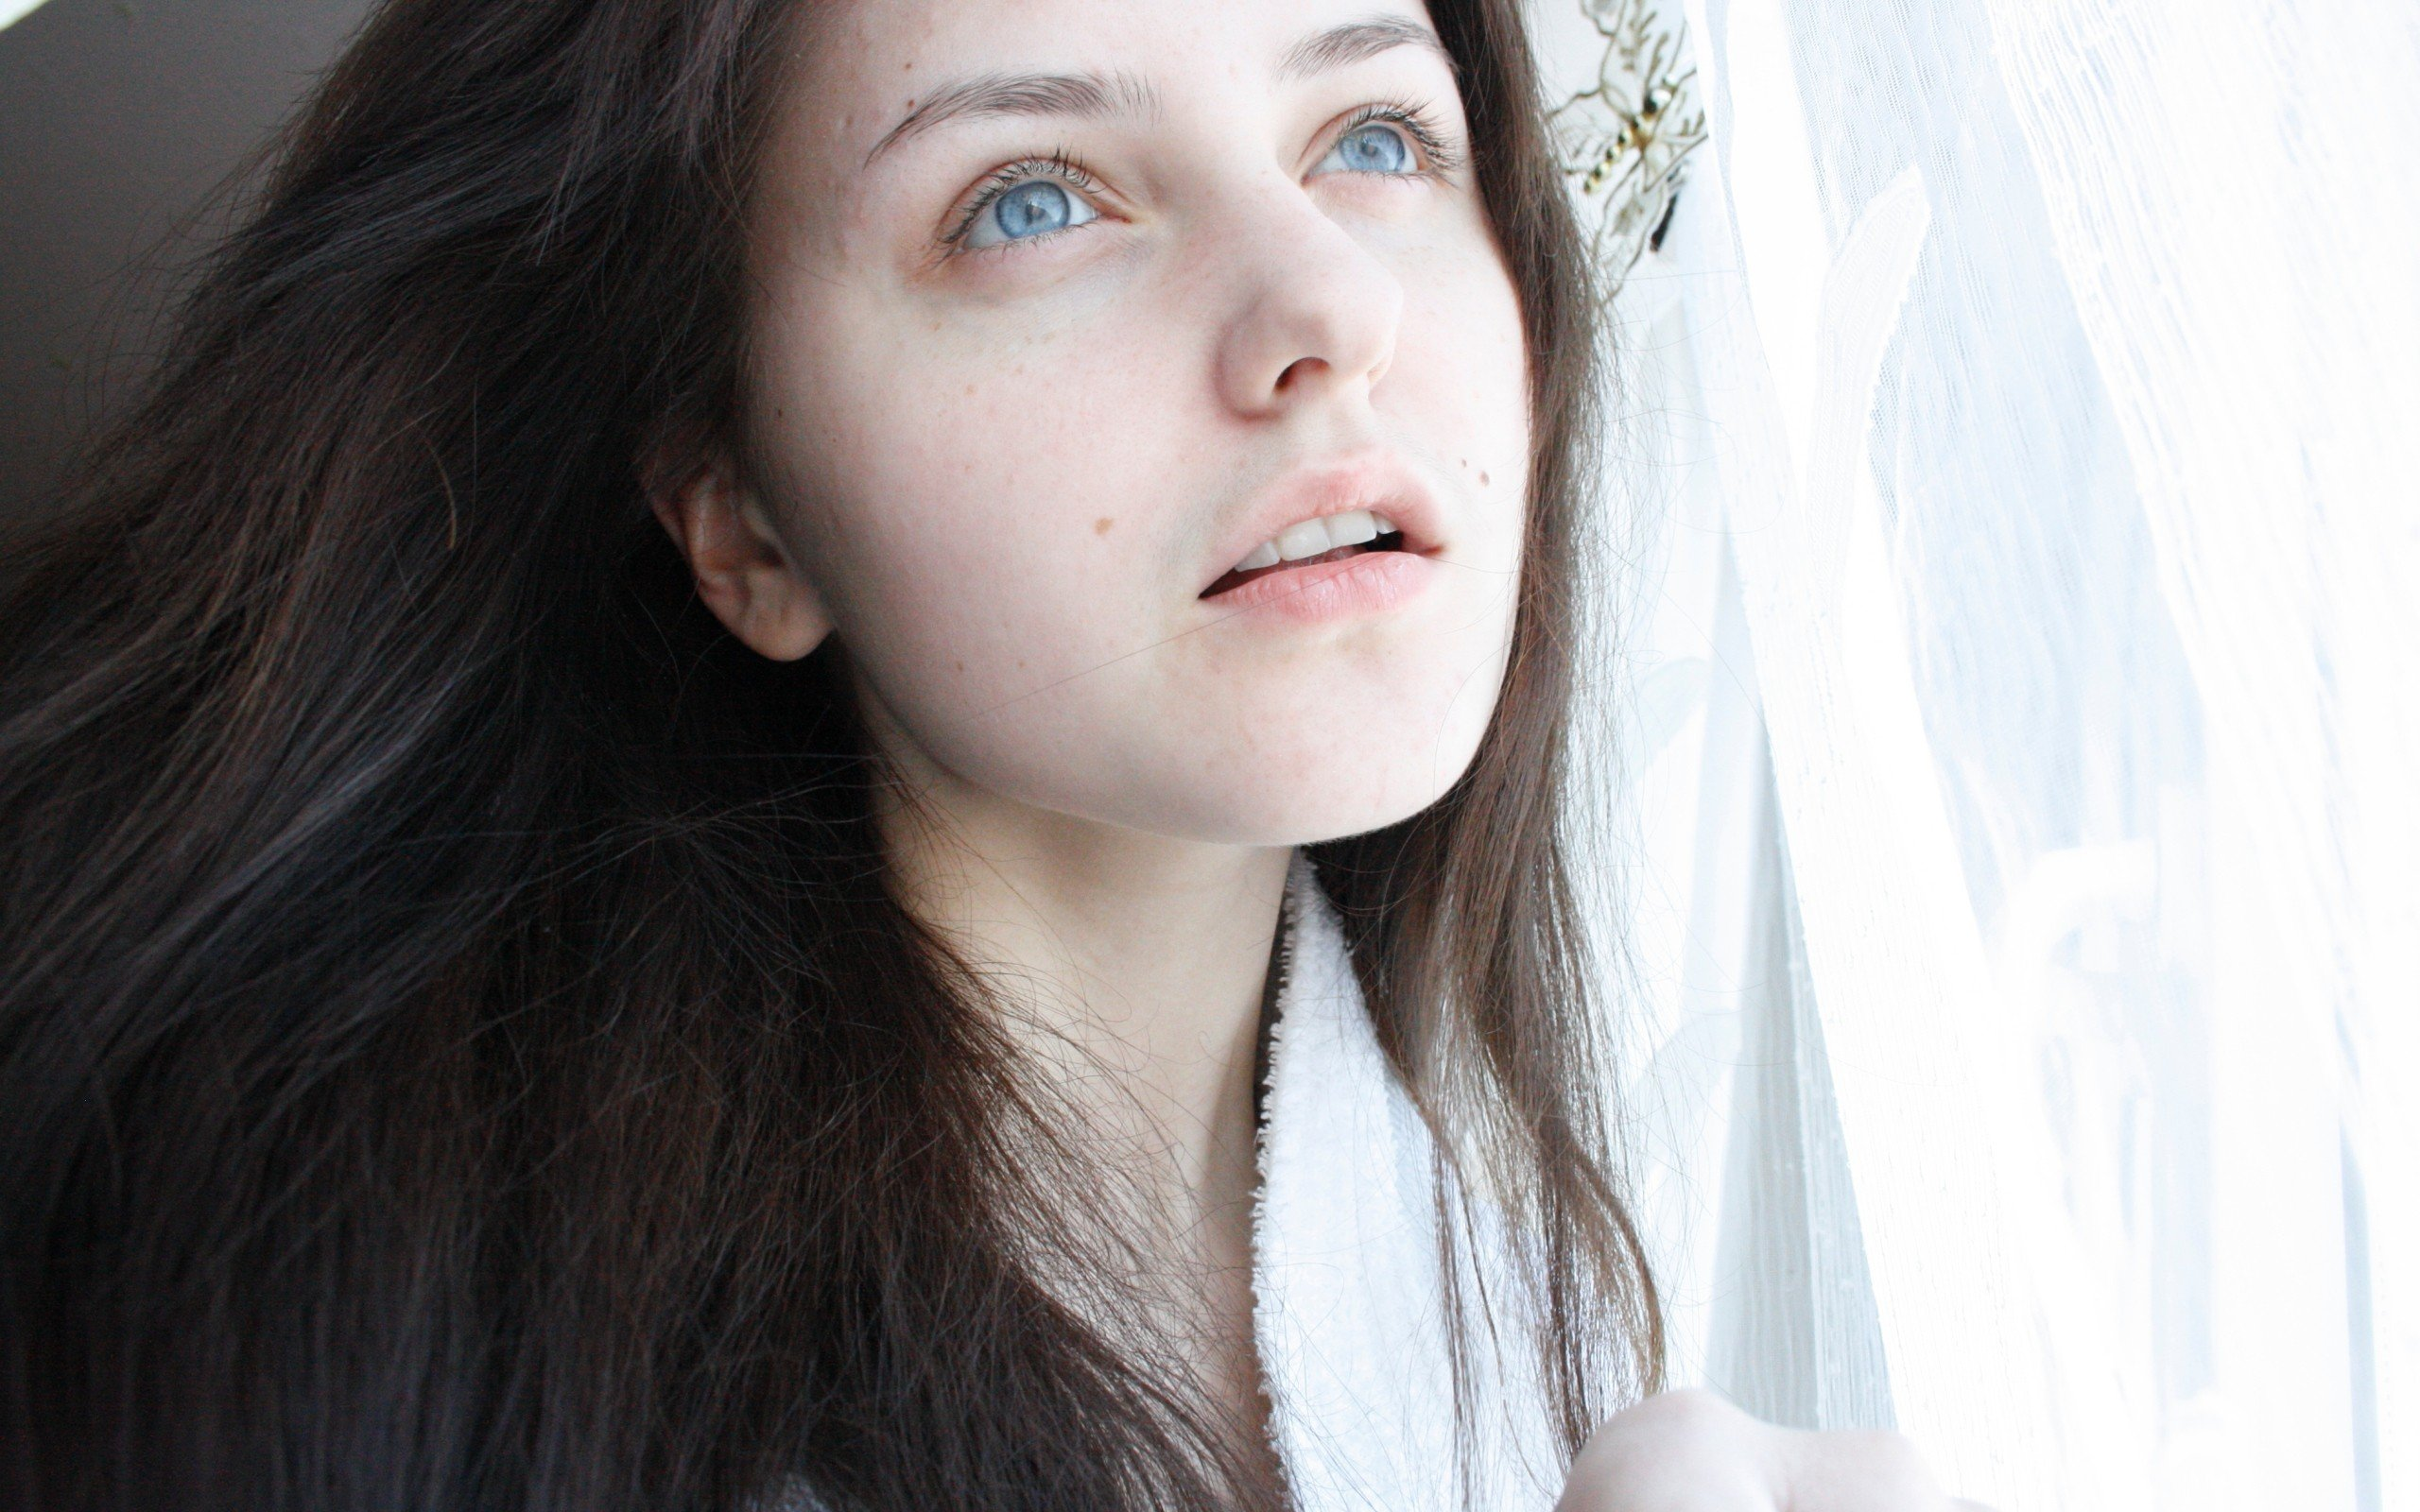 women, Brunette, Blue eyes Wallpaper